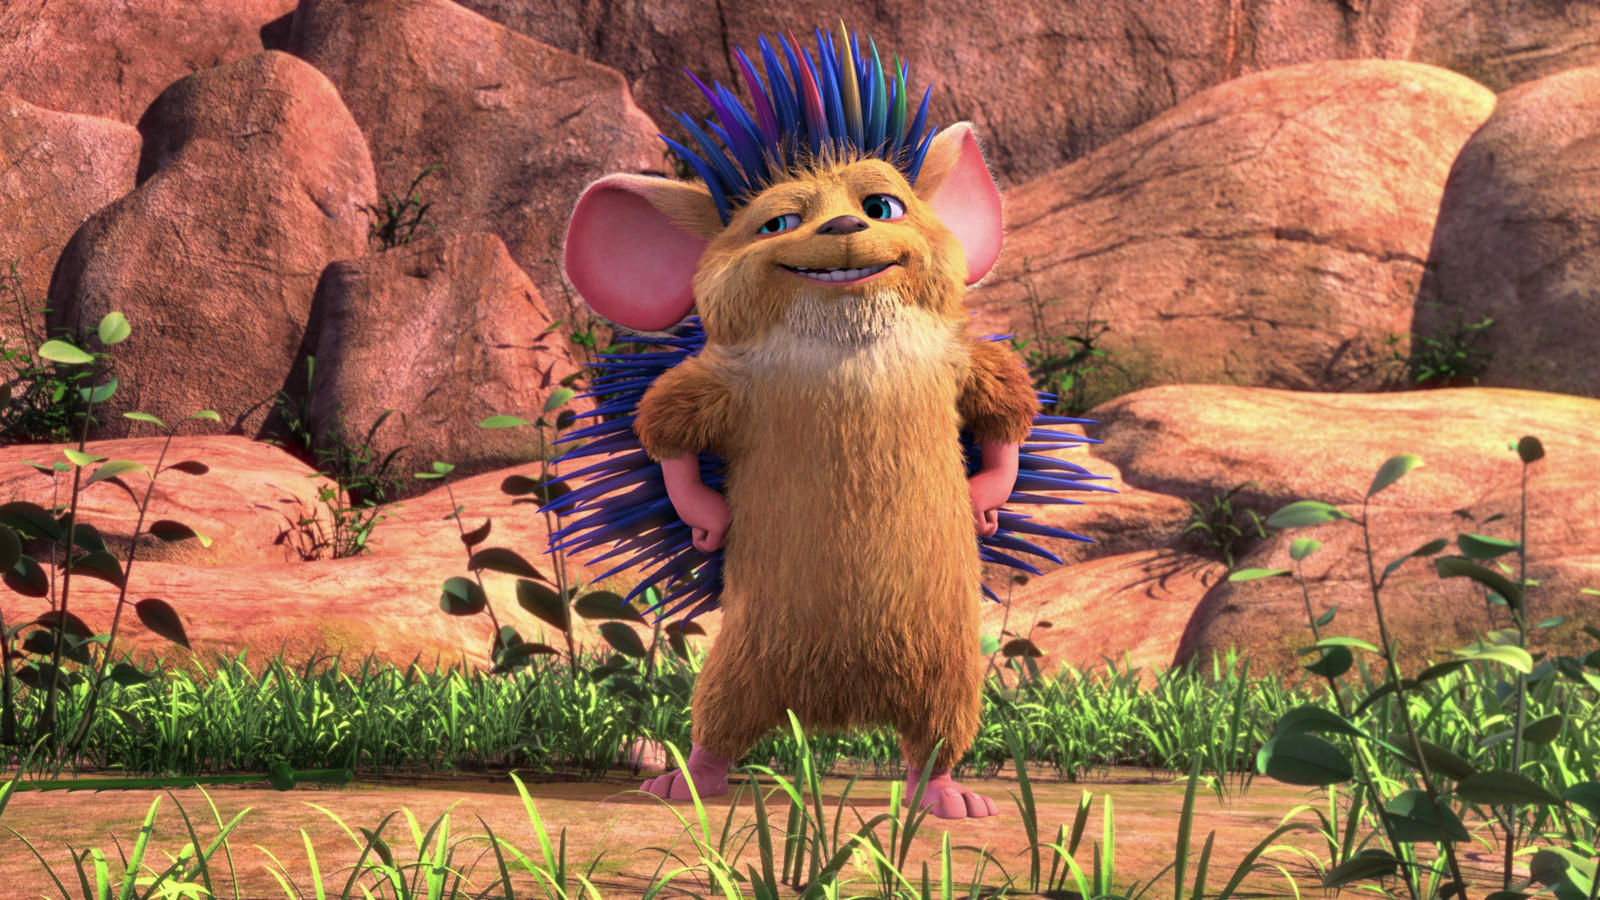 Animated Hedgehogs Fails The Cute Test La Times